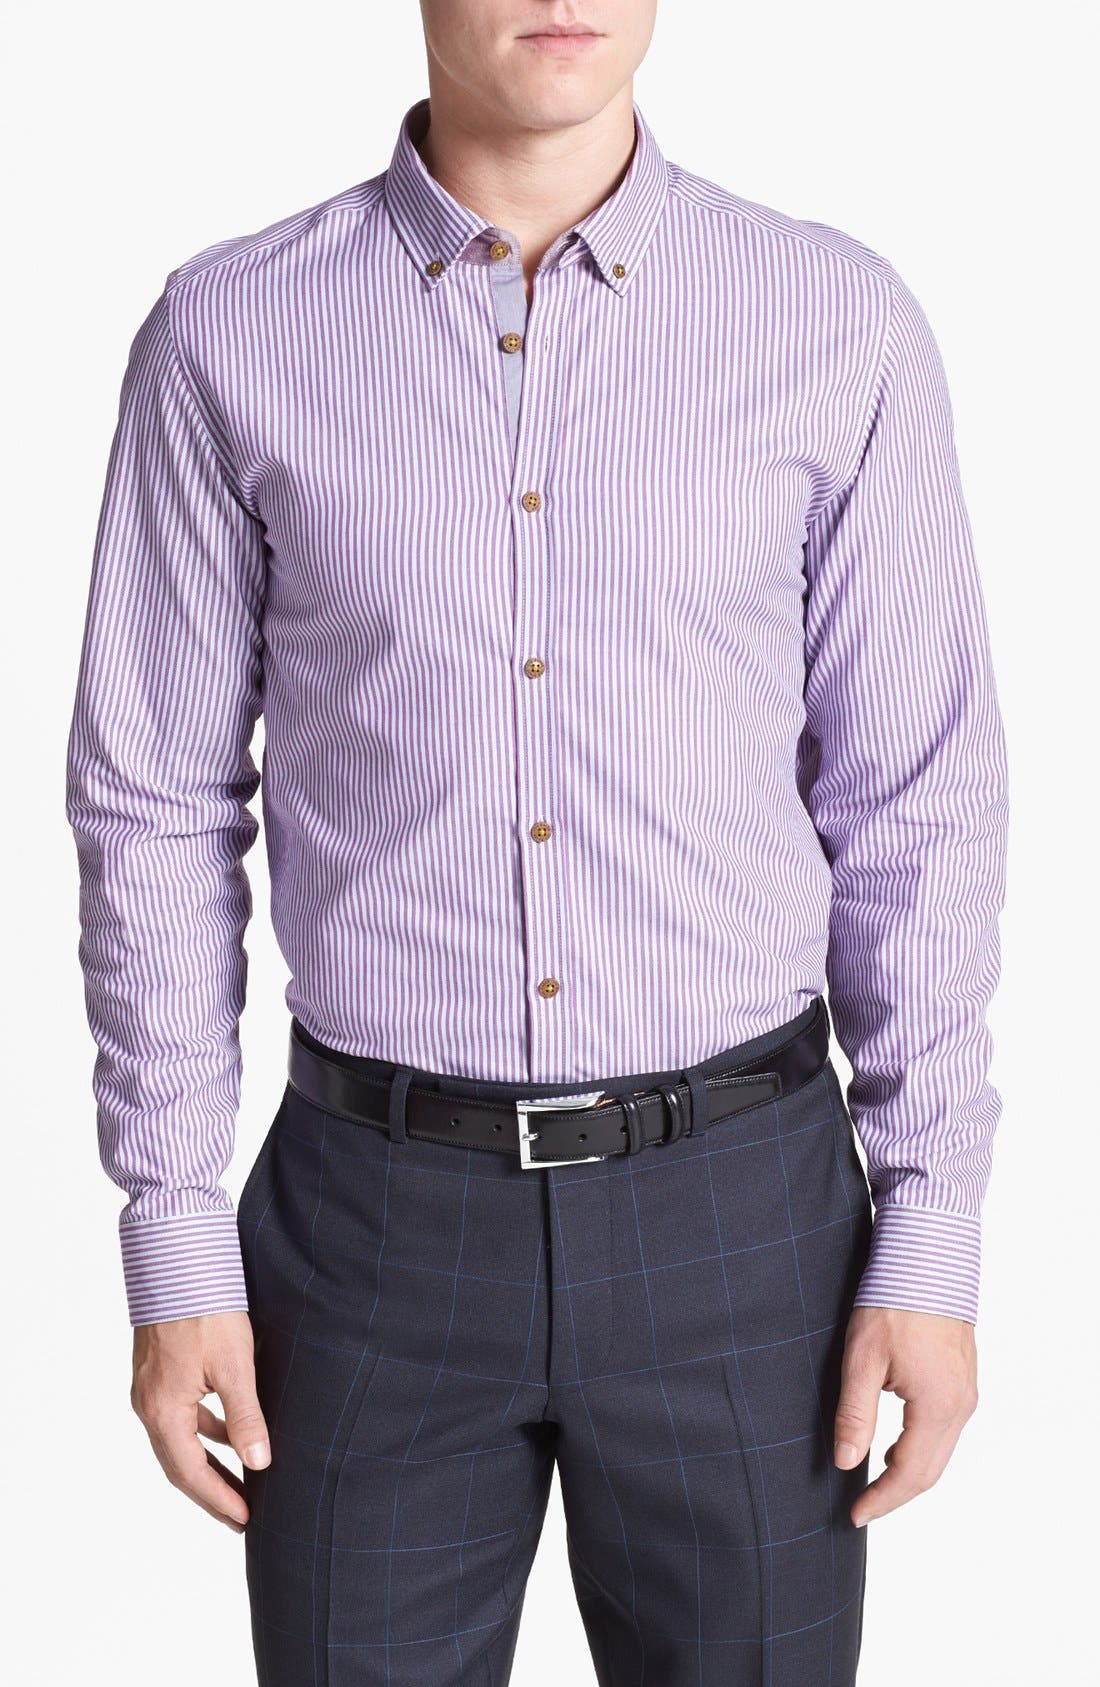 Alternate Image 1 Selected - Ted Baker London 'Shauno' Trim Fit Sport Shirt